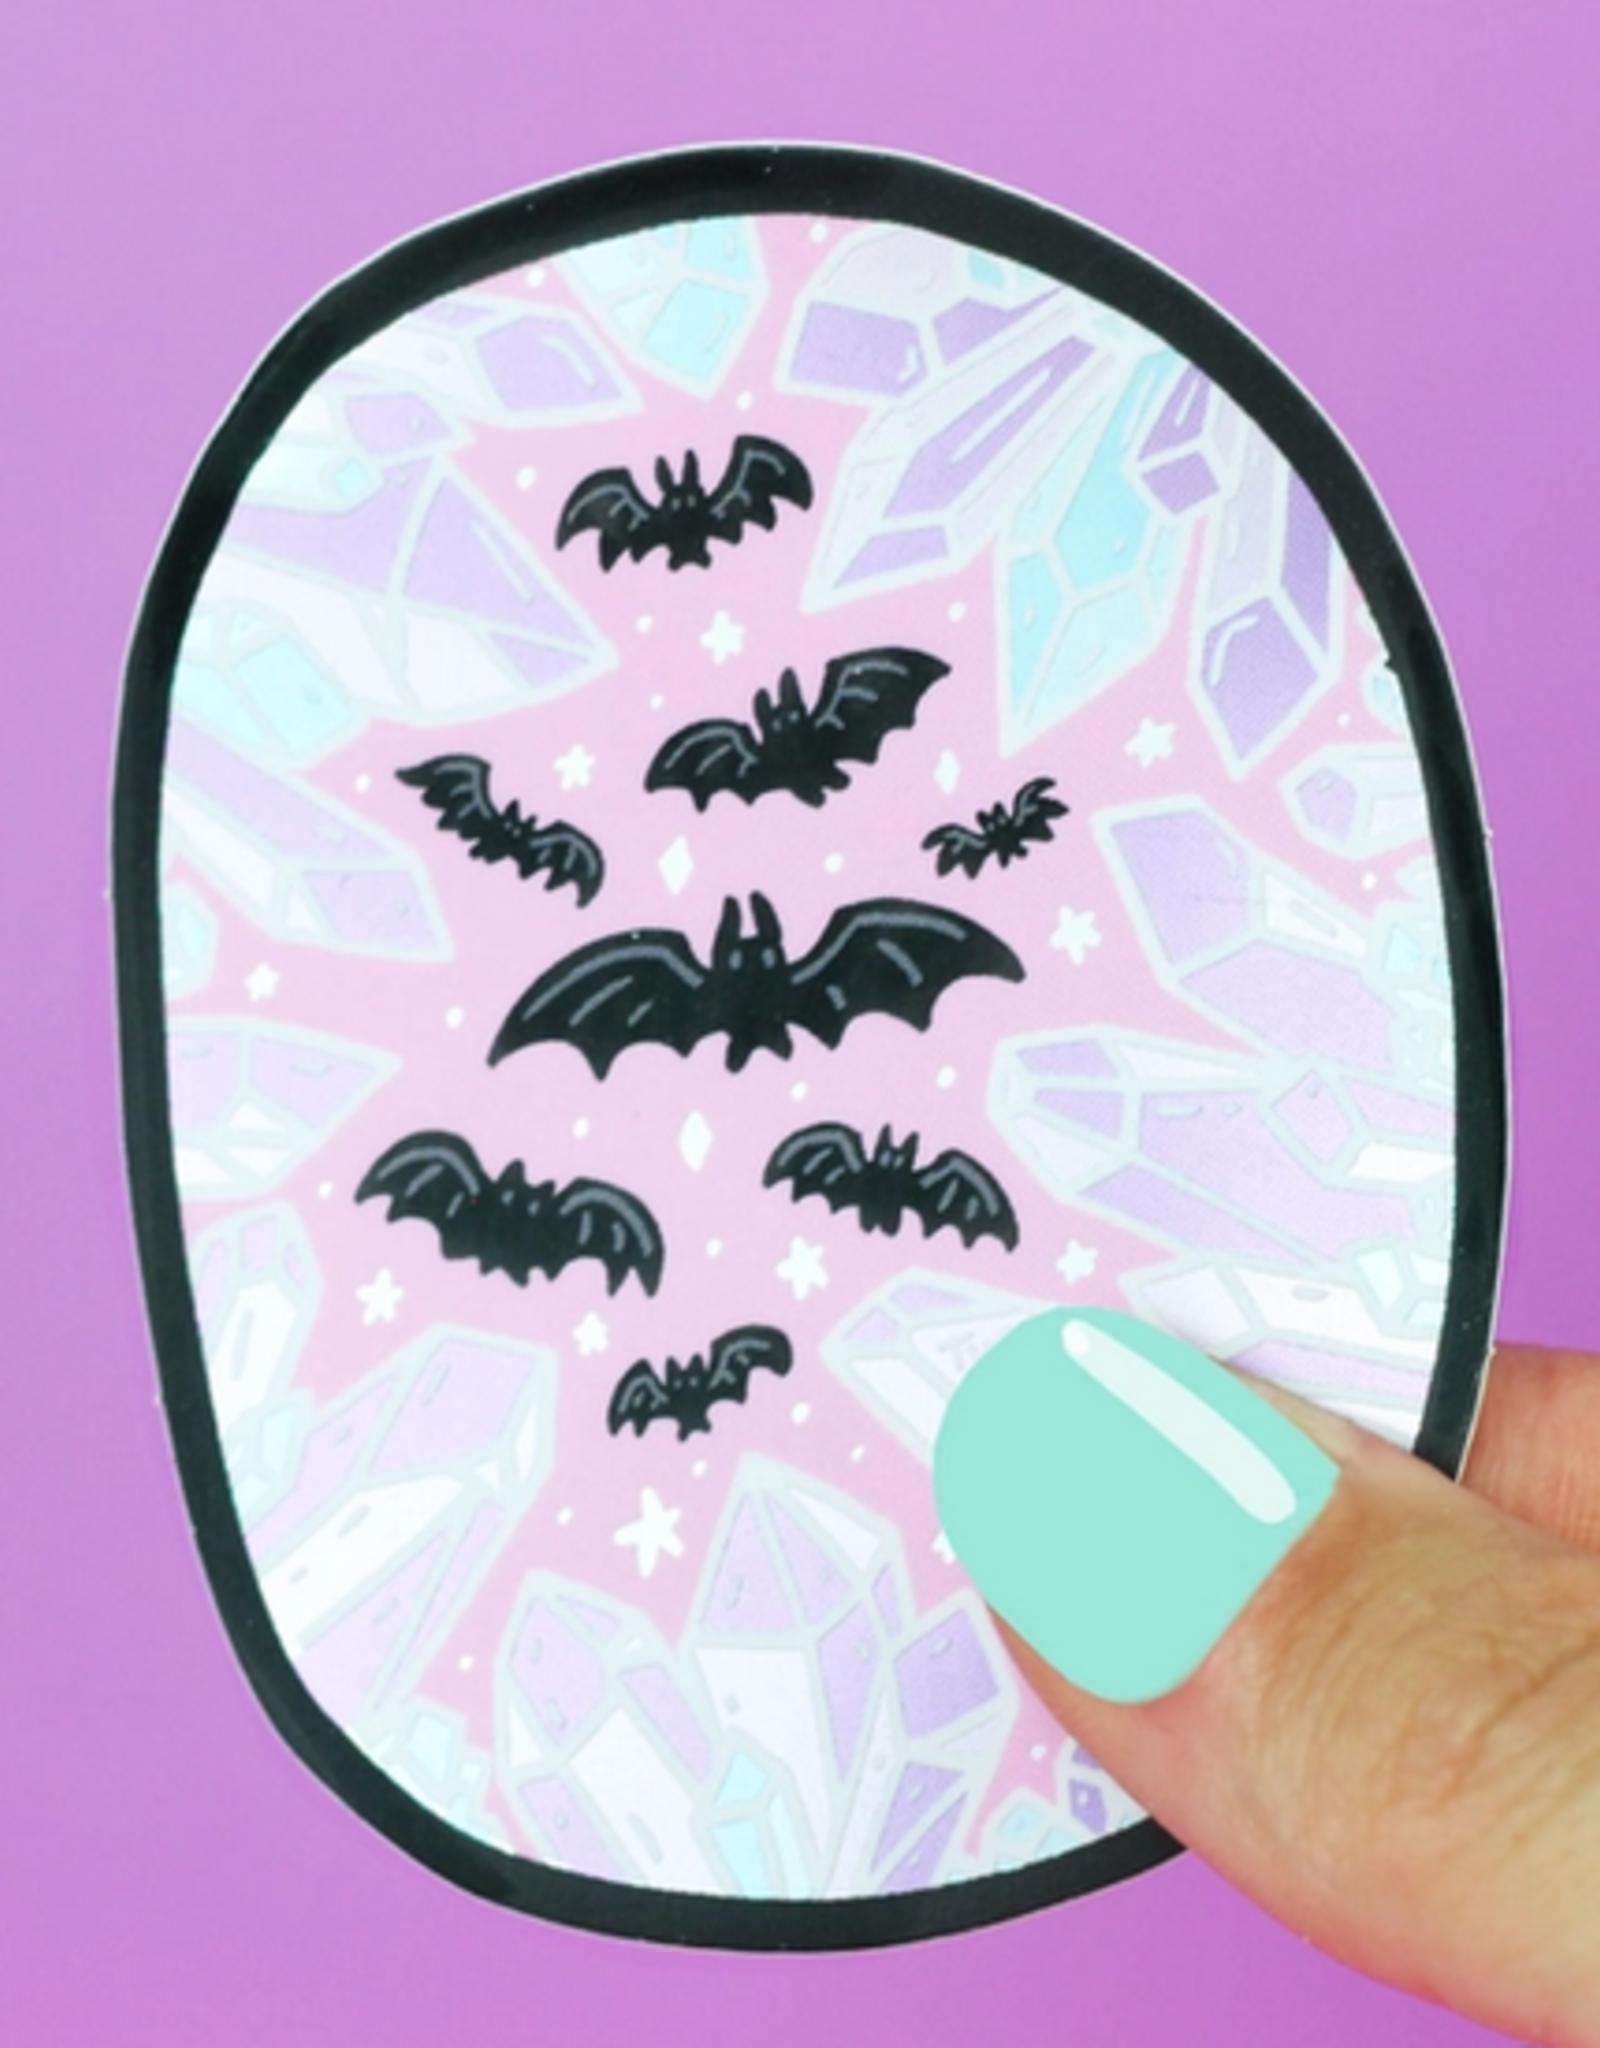 Turtle's Soup Crystal Cave Bats Vinyl Sticker (Holographic)